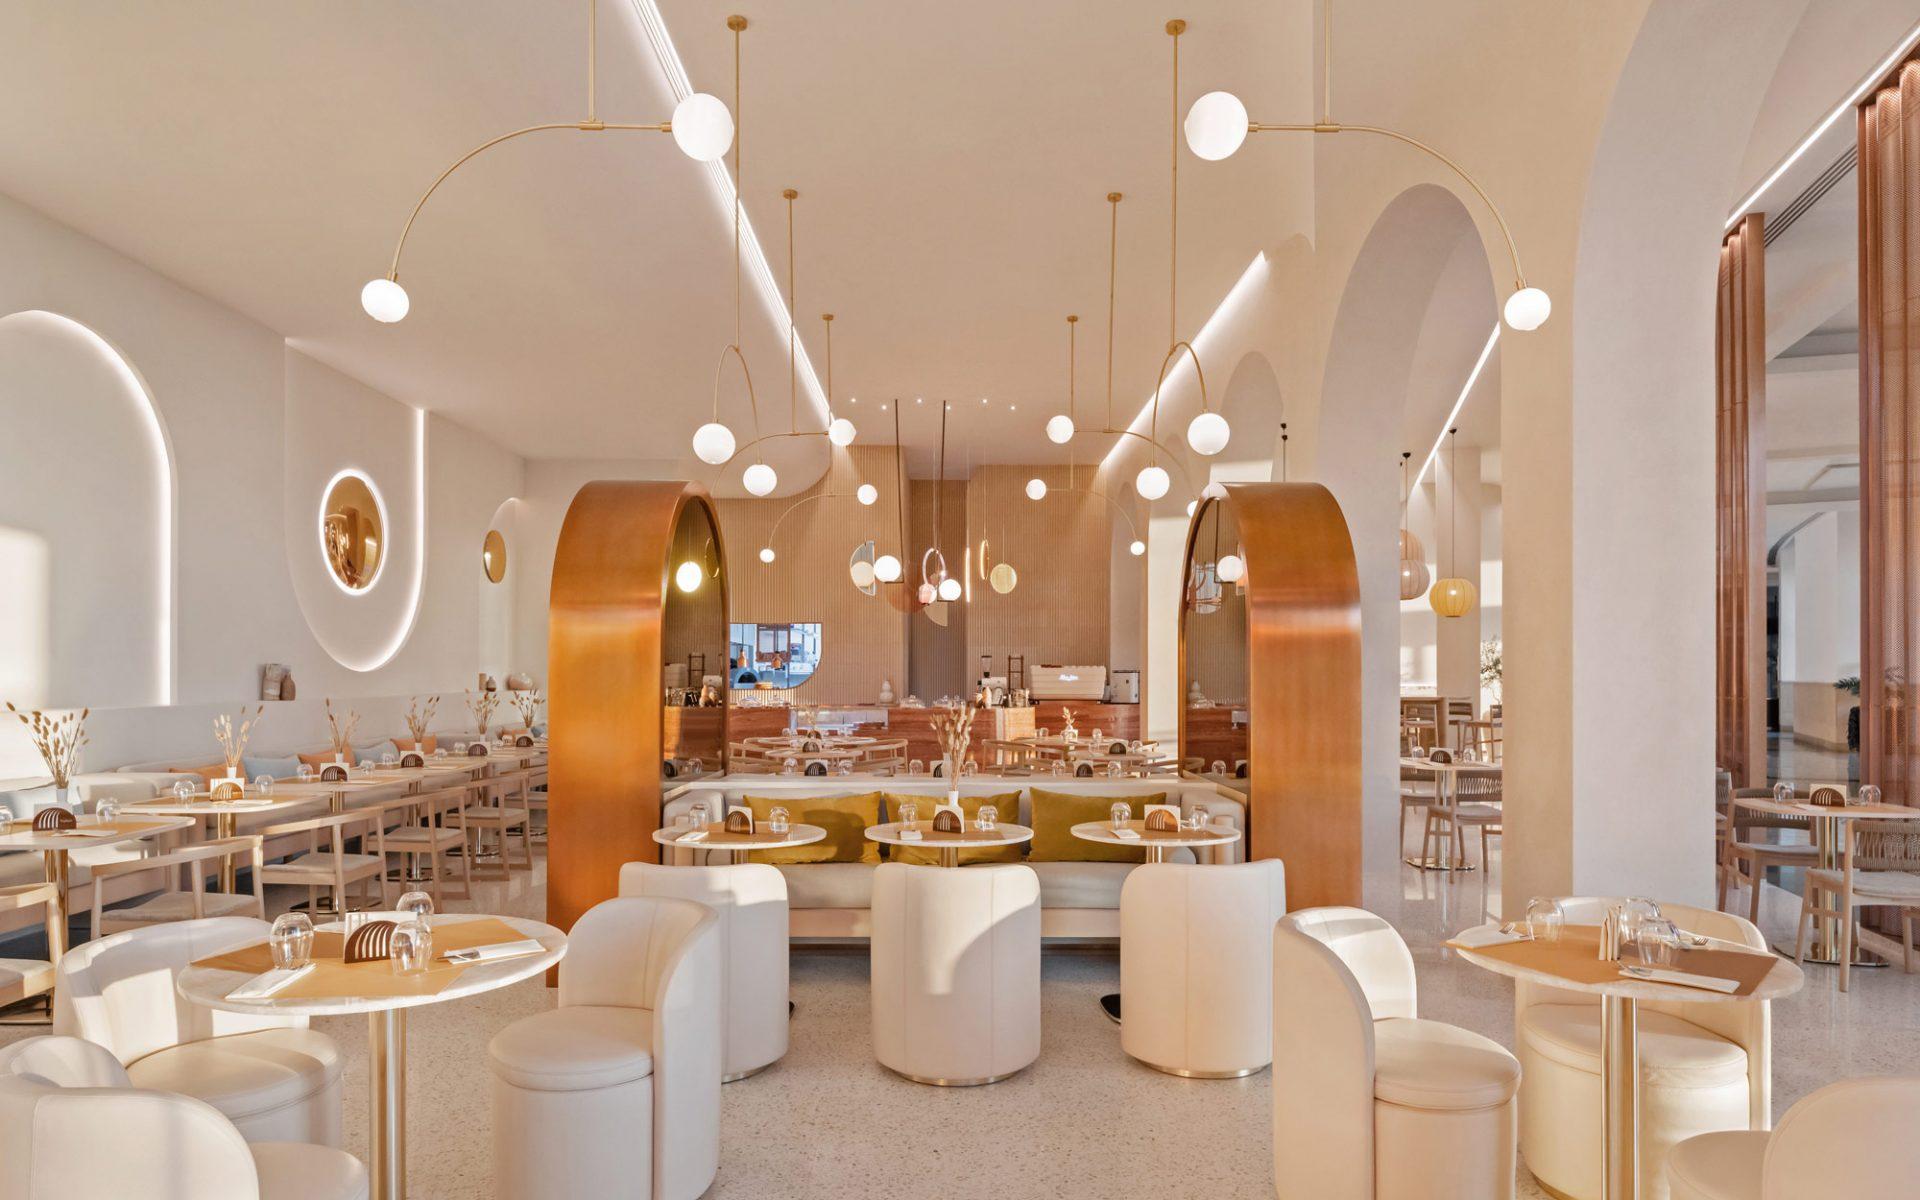 TOPLUM RESTAURANT Mirdif City Center, Dubai Interior Design: XO Atelier